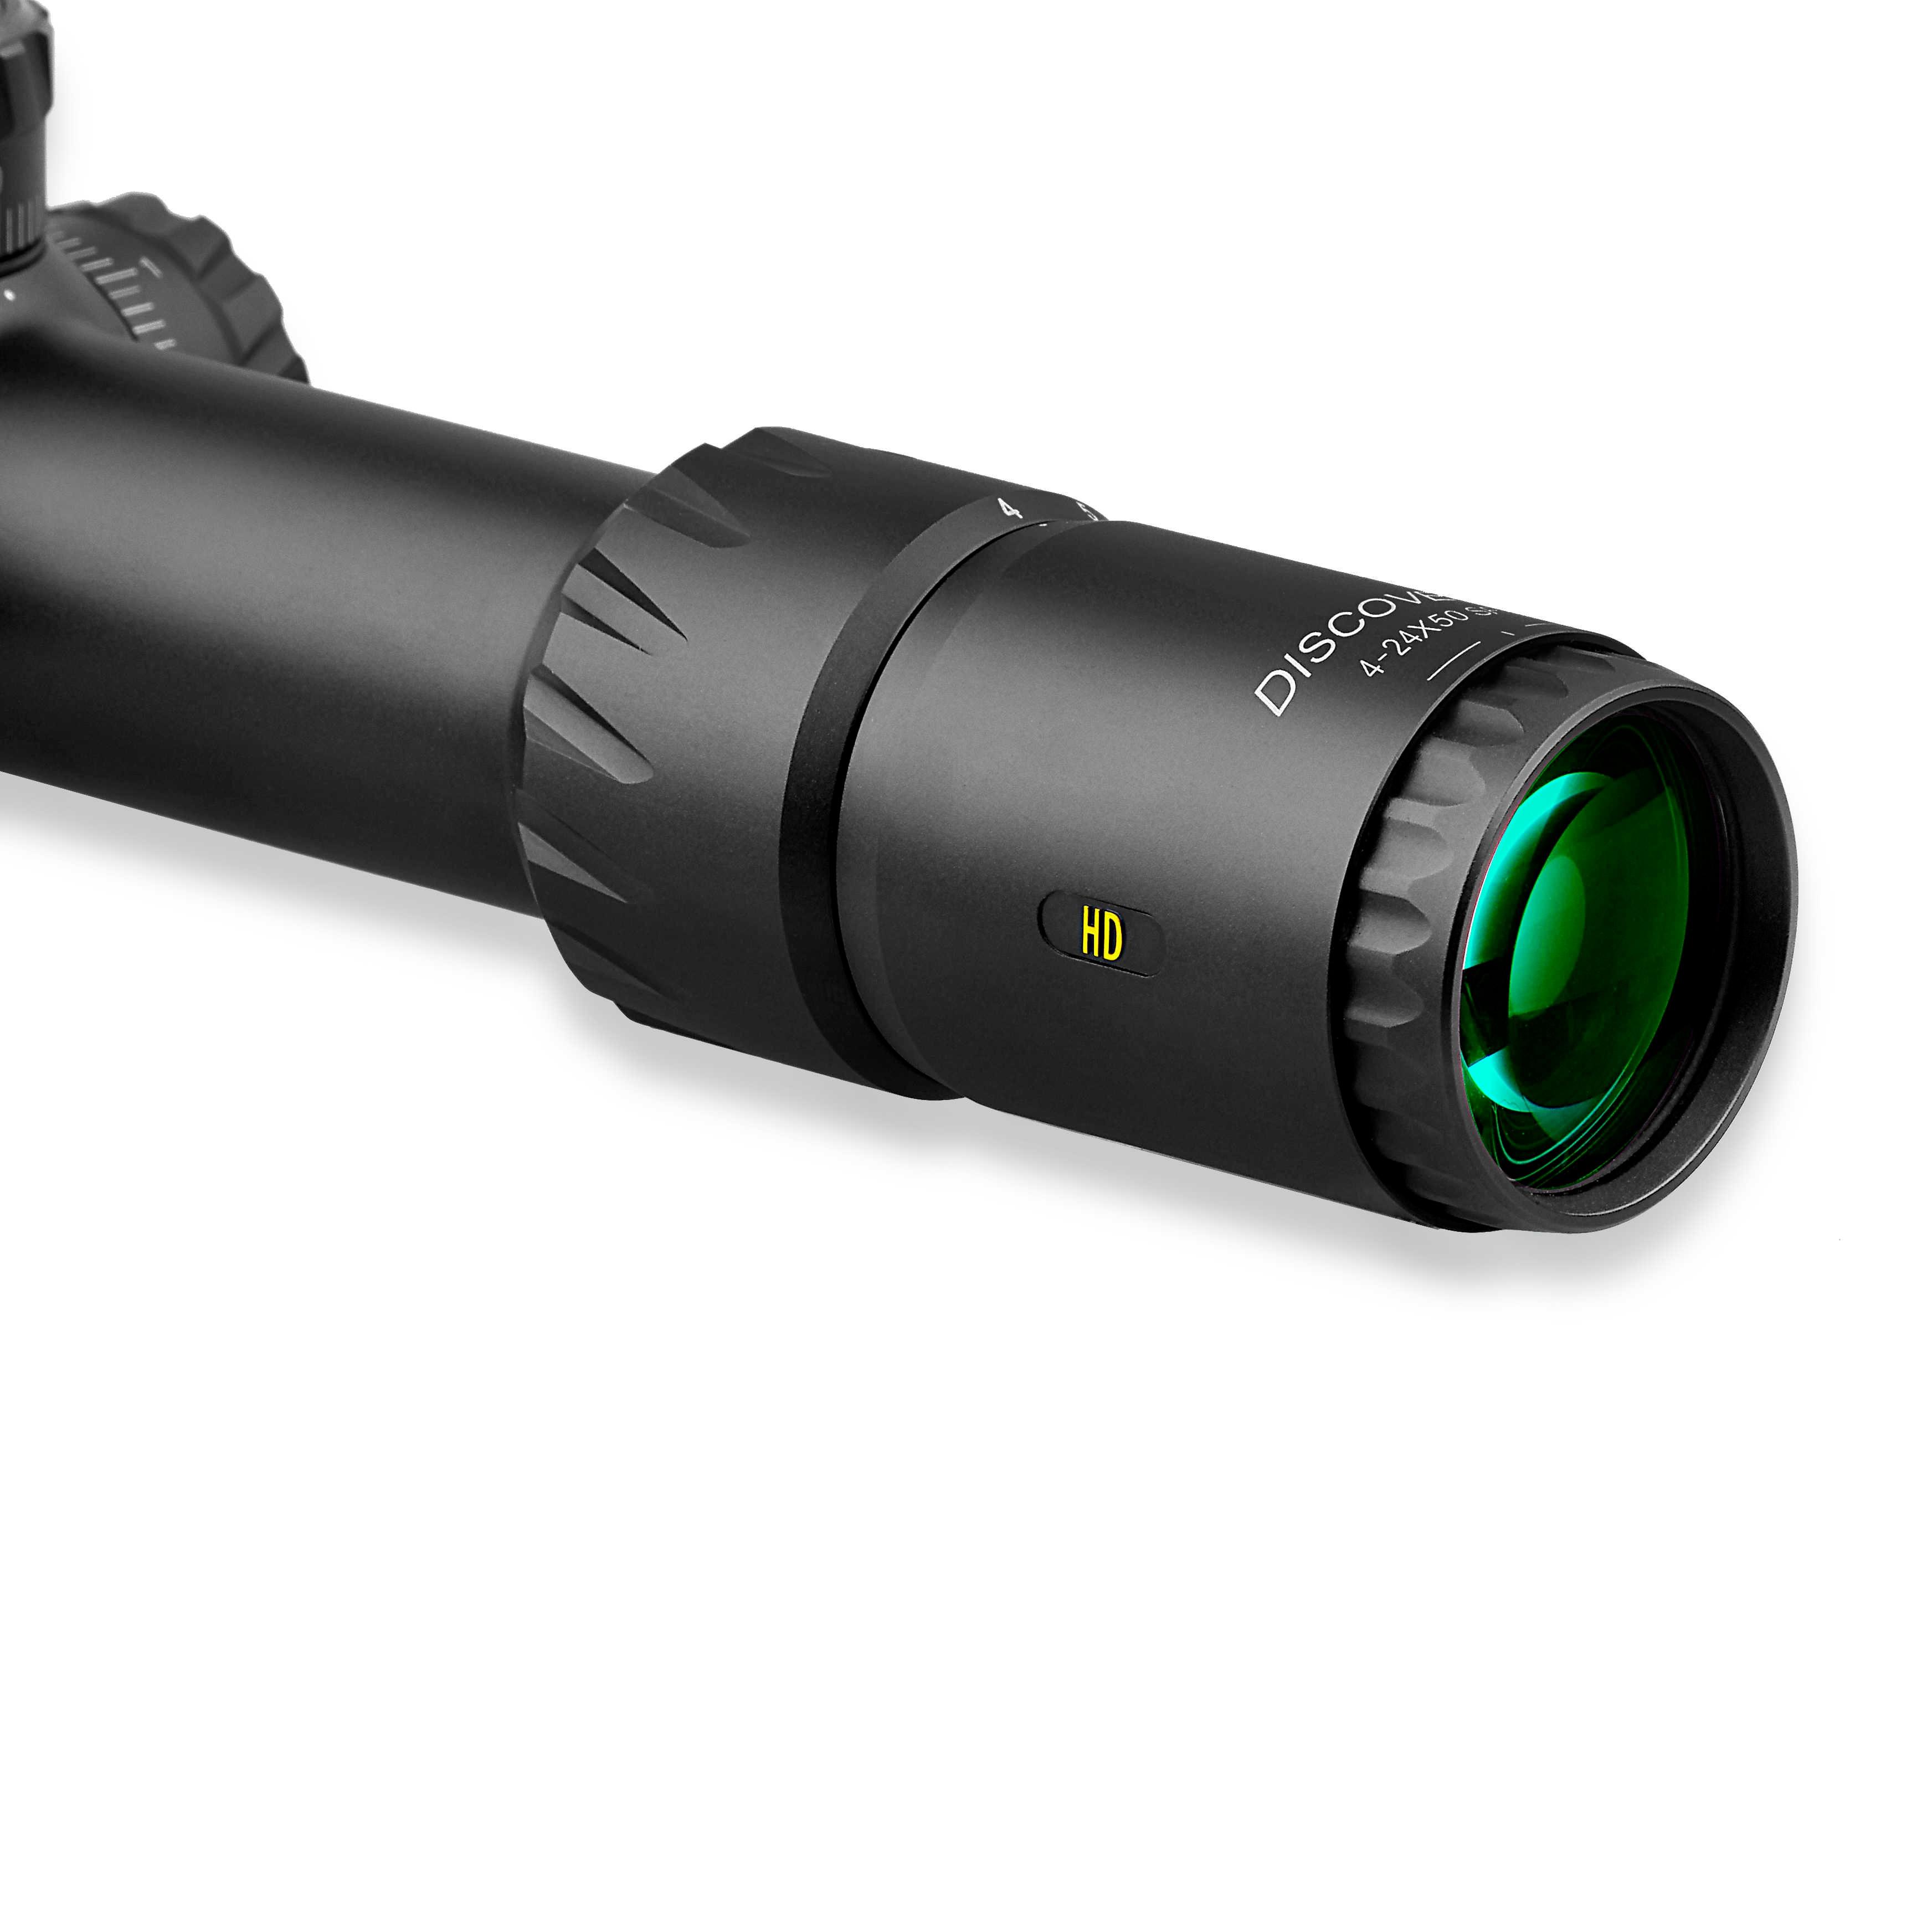 Discovery Hd 4-24 X50 Ffp Geavanceerde Pistool Bezienswaardigheden Hunting Rifle Jacht Optics Scope China Beste